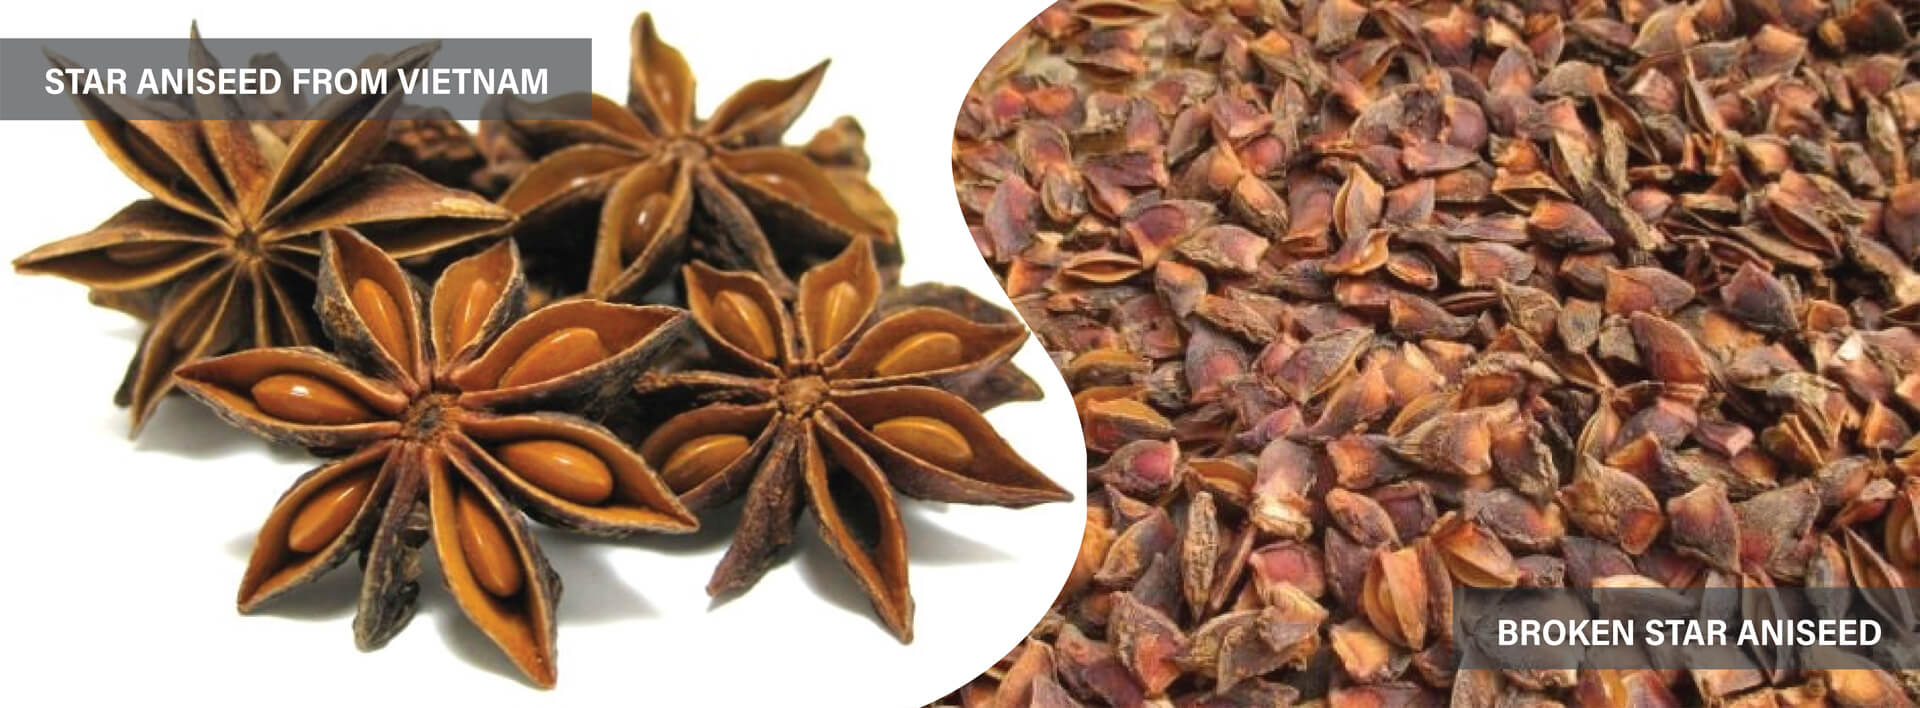 Hoa hồi / Star aniseed